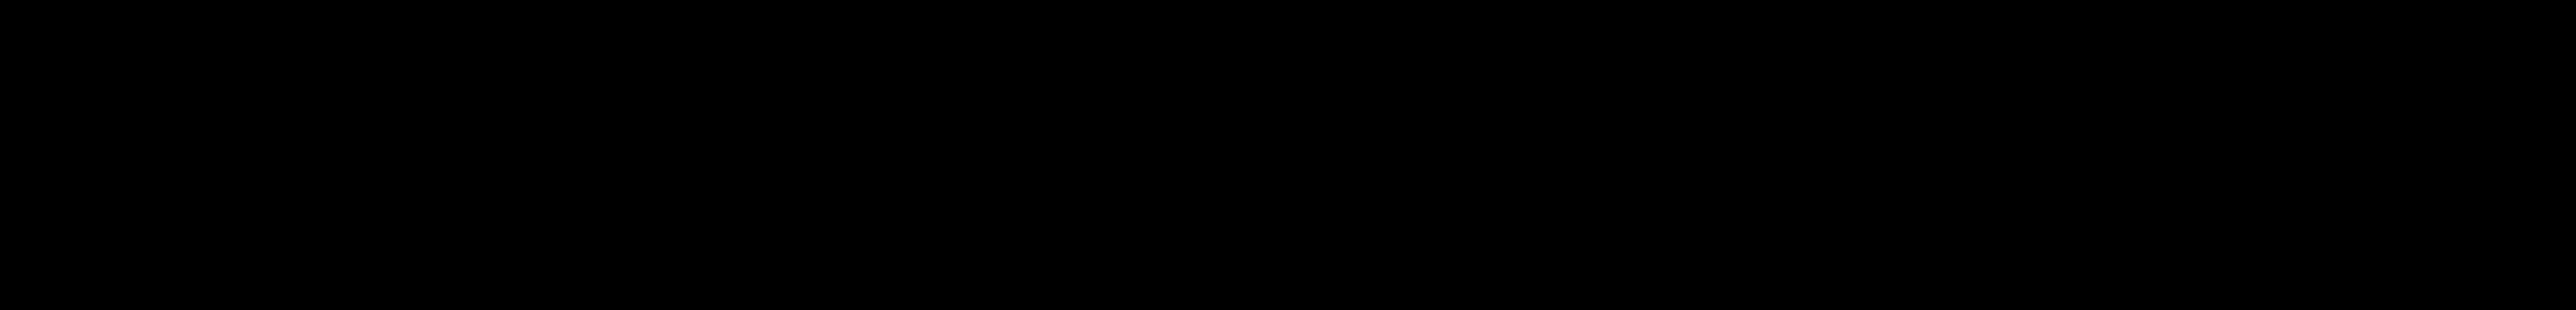 Logotipo RTP Notícias